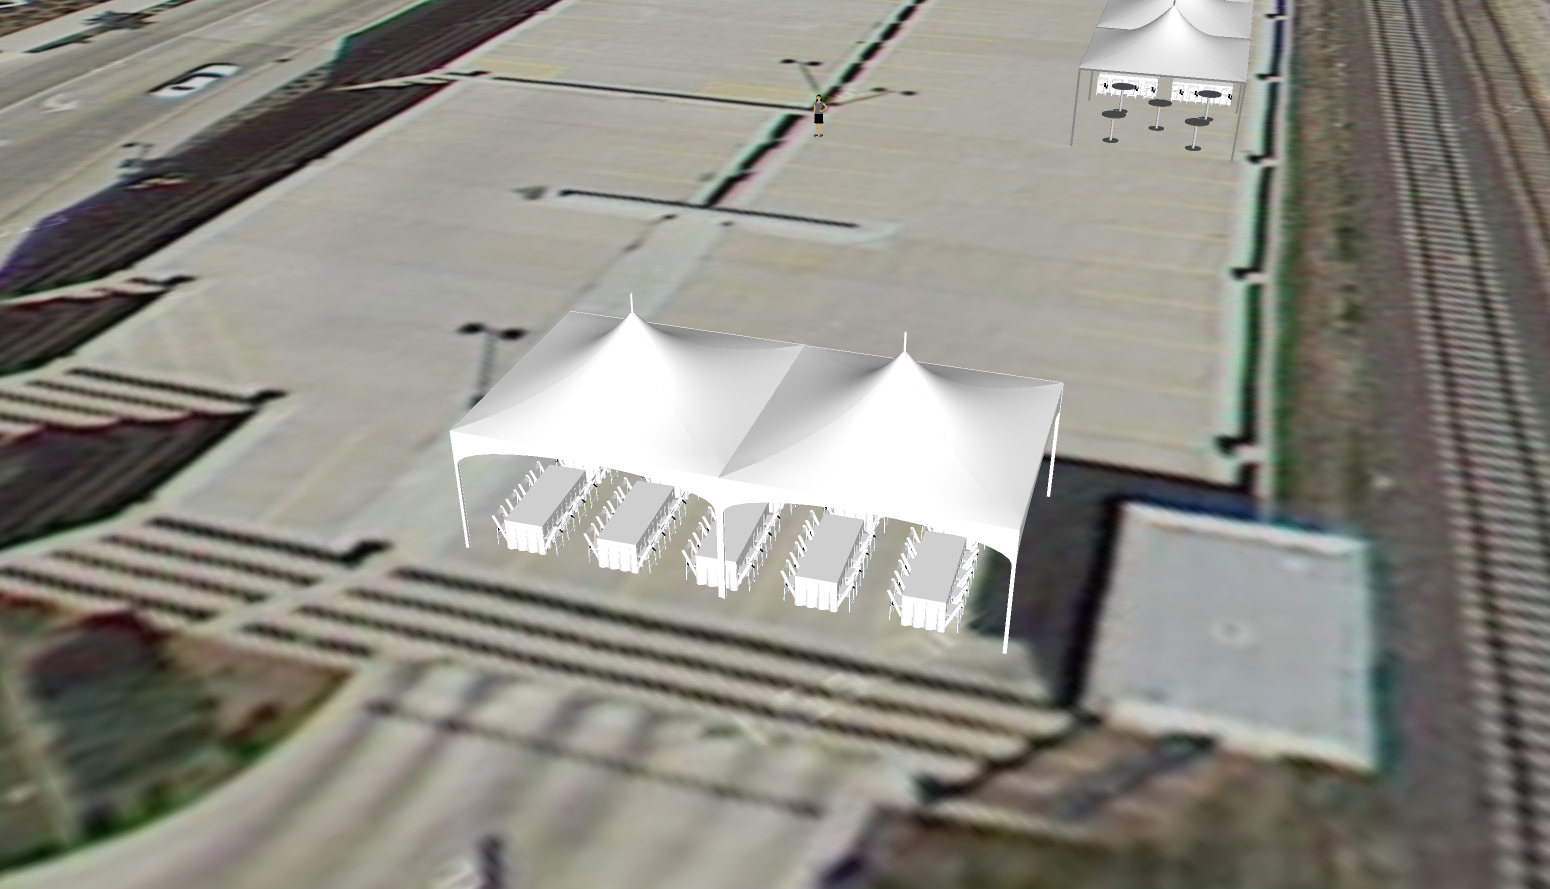 6.11.2015 Marriot rooftop 20x40 80 people.png